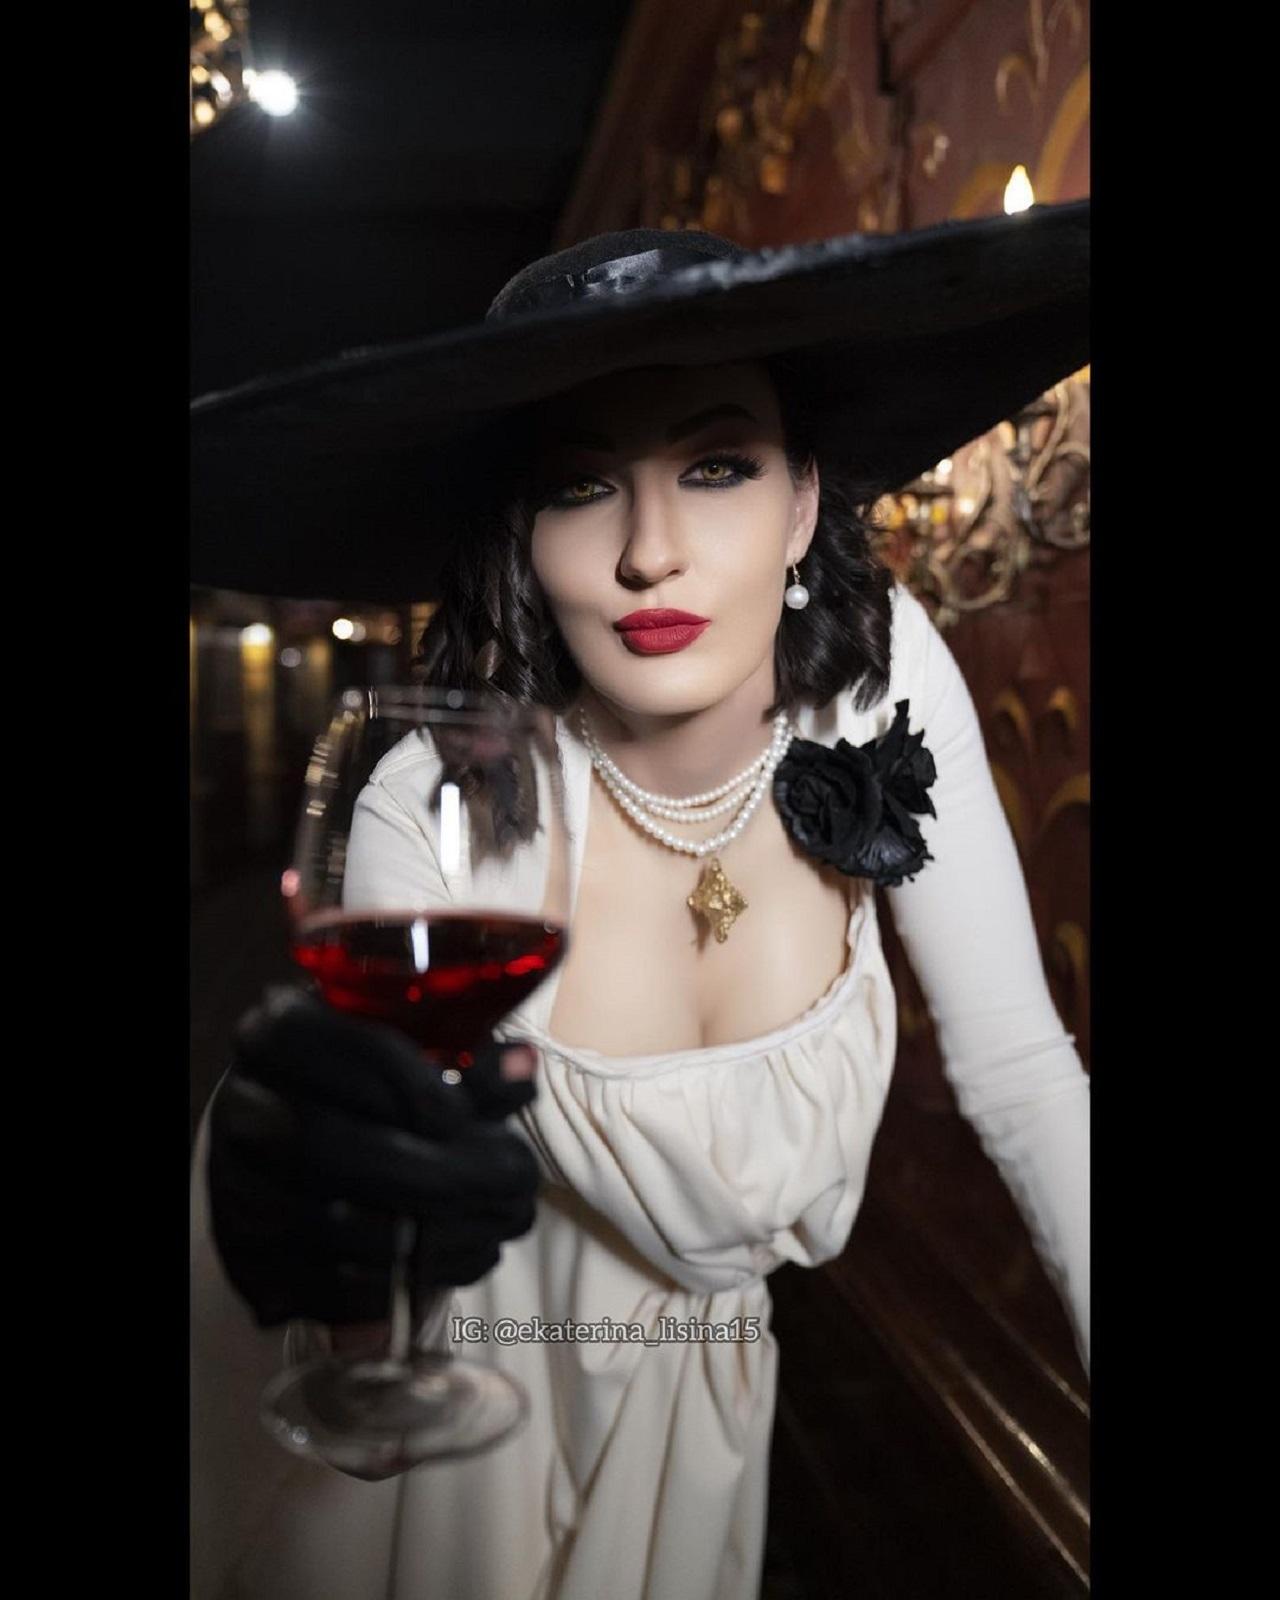 Lady Dimitrescu Cosplay Yekaterina Lisina Resident Evil Estatura